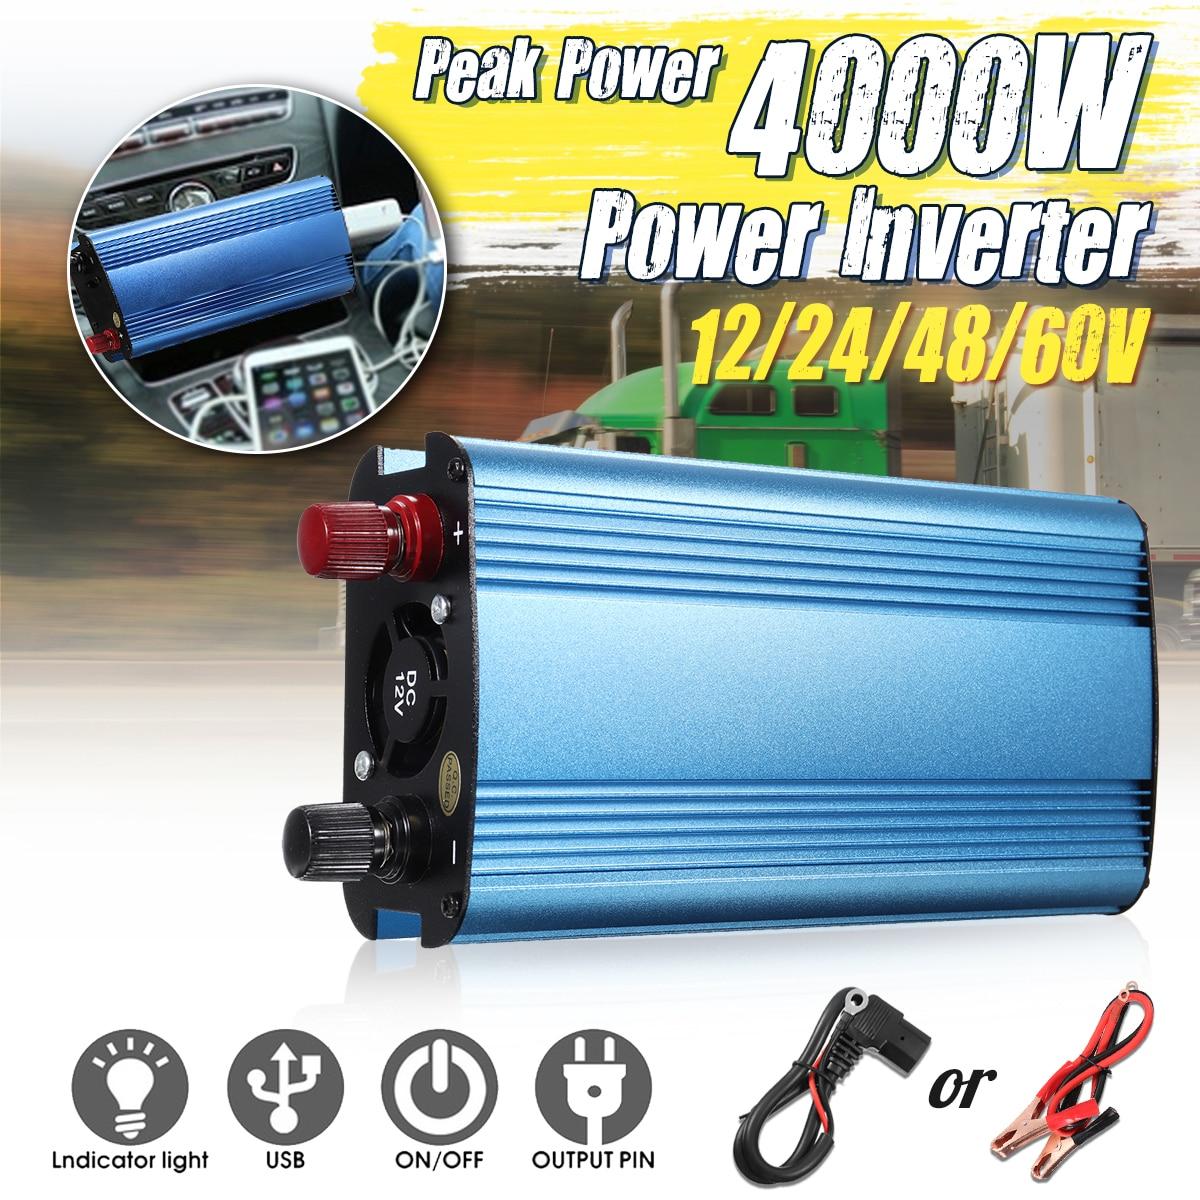 KROAK 4000W Peak Power Car Power Inverter Charger Sine Wave DC 12V/24V/48V/60V To AC 220V Inverter Voltage Converter 4000w peak w 4 usb car power inverter 2000w dc 12v to ac 220v charger converter car led power inverter 4000w dc 12v to ac220v